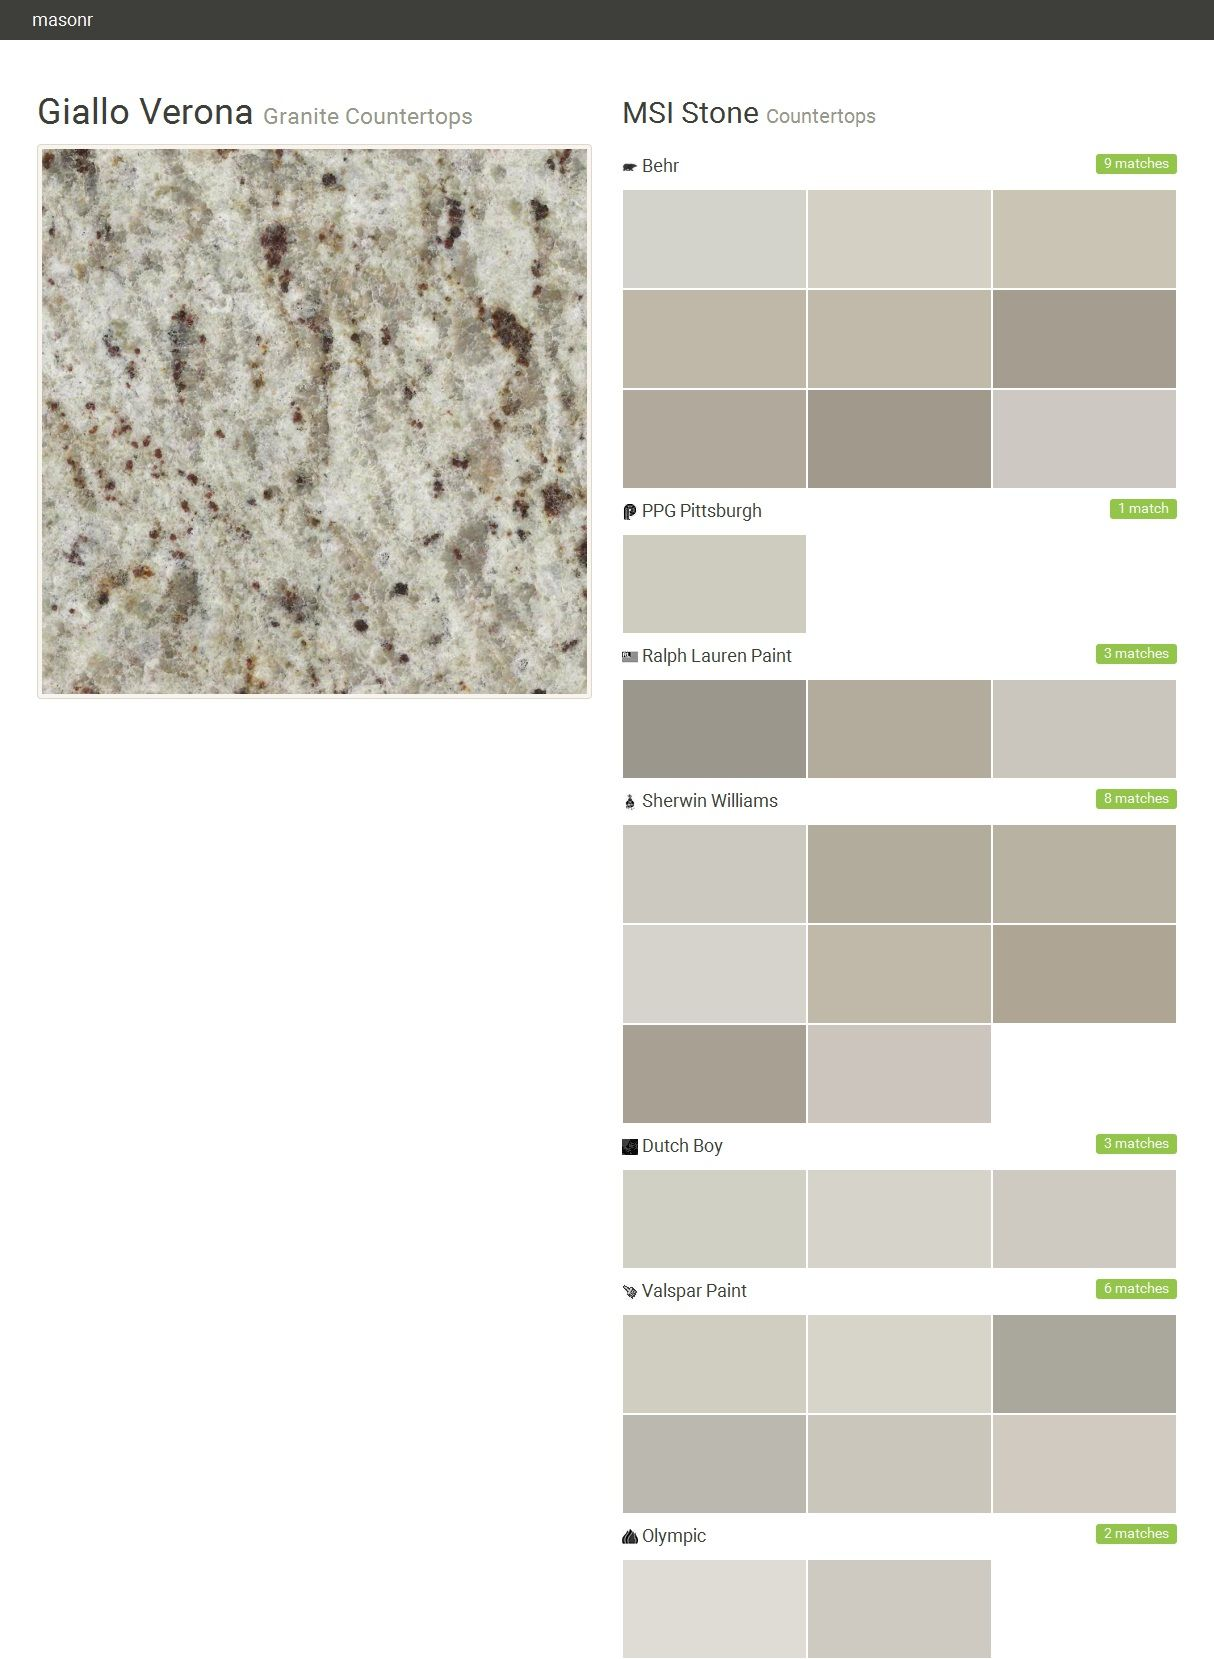 Giallo Verona Granite Countertops Countertops Msi Stone